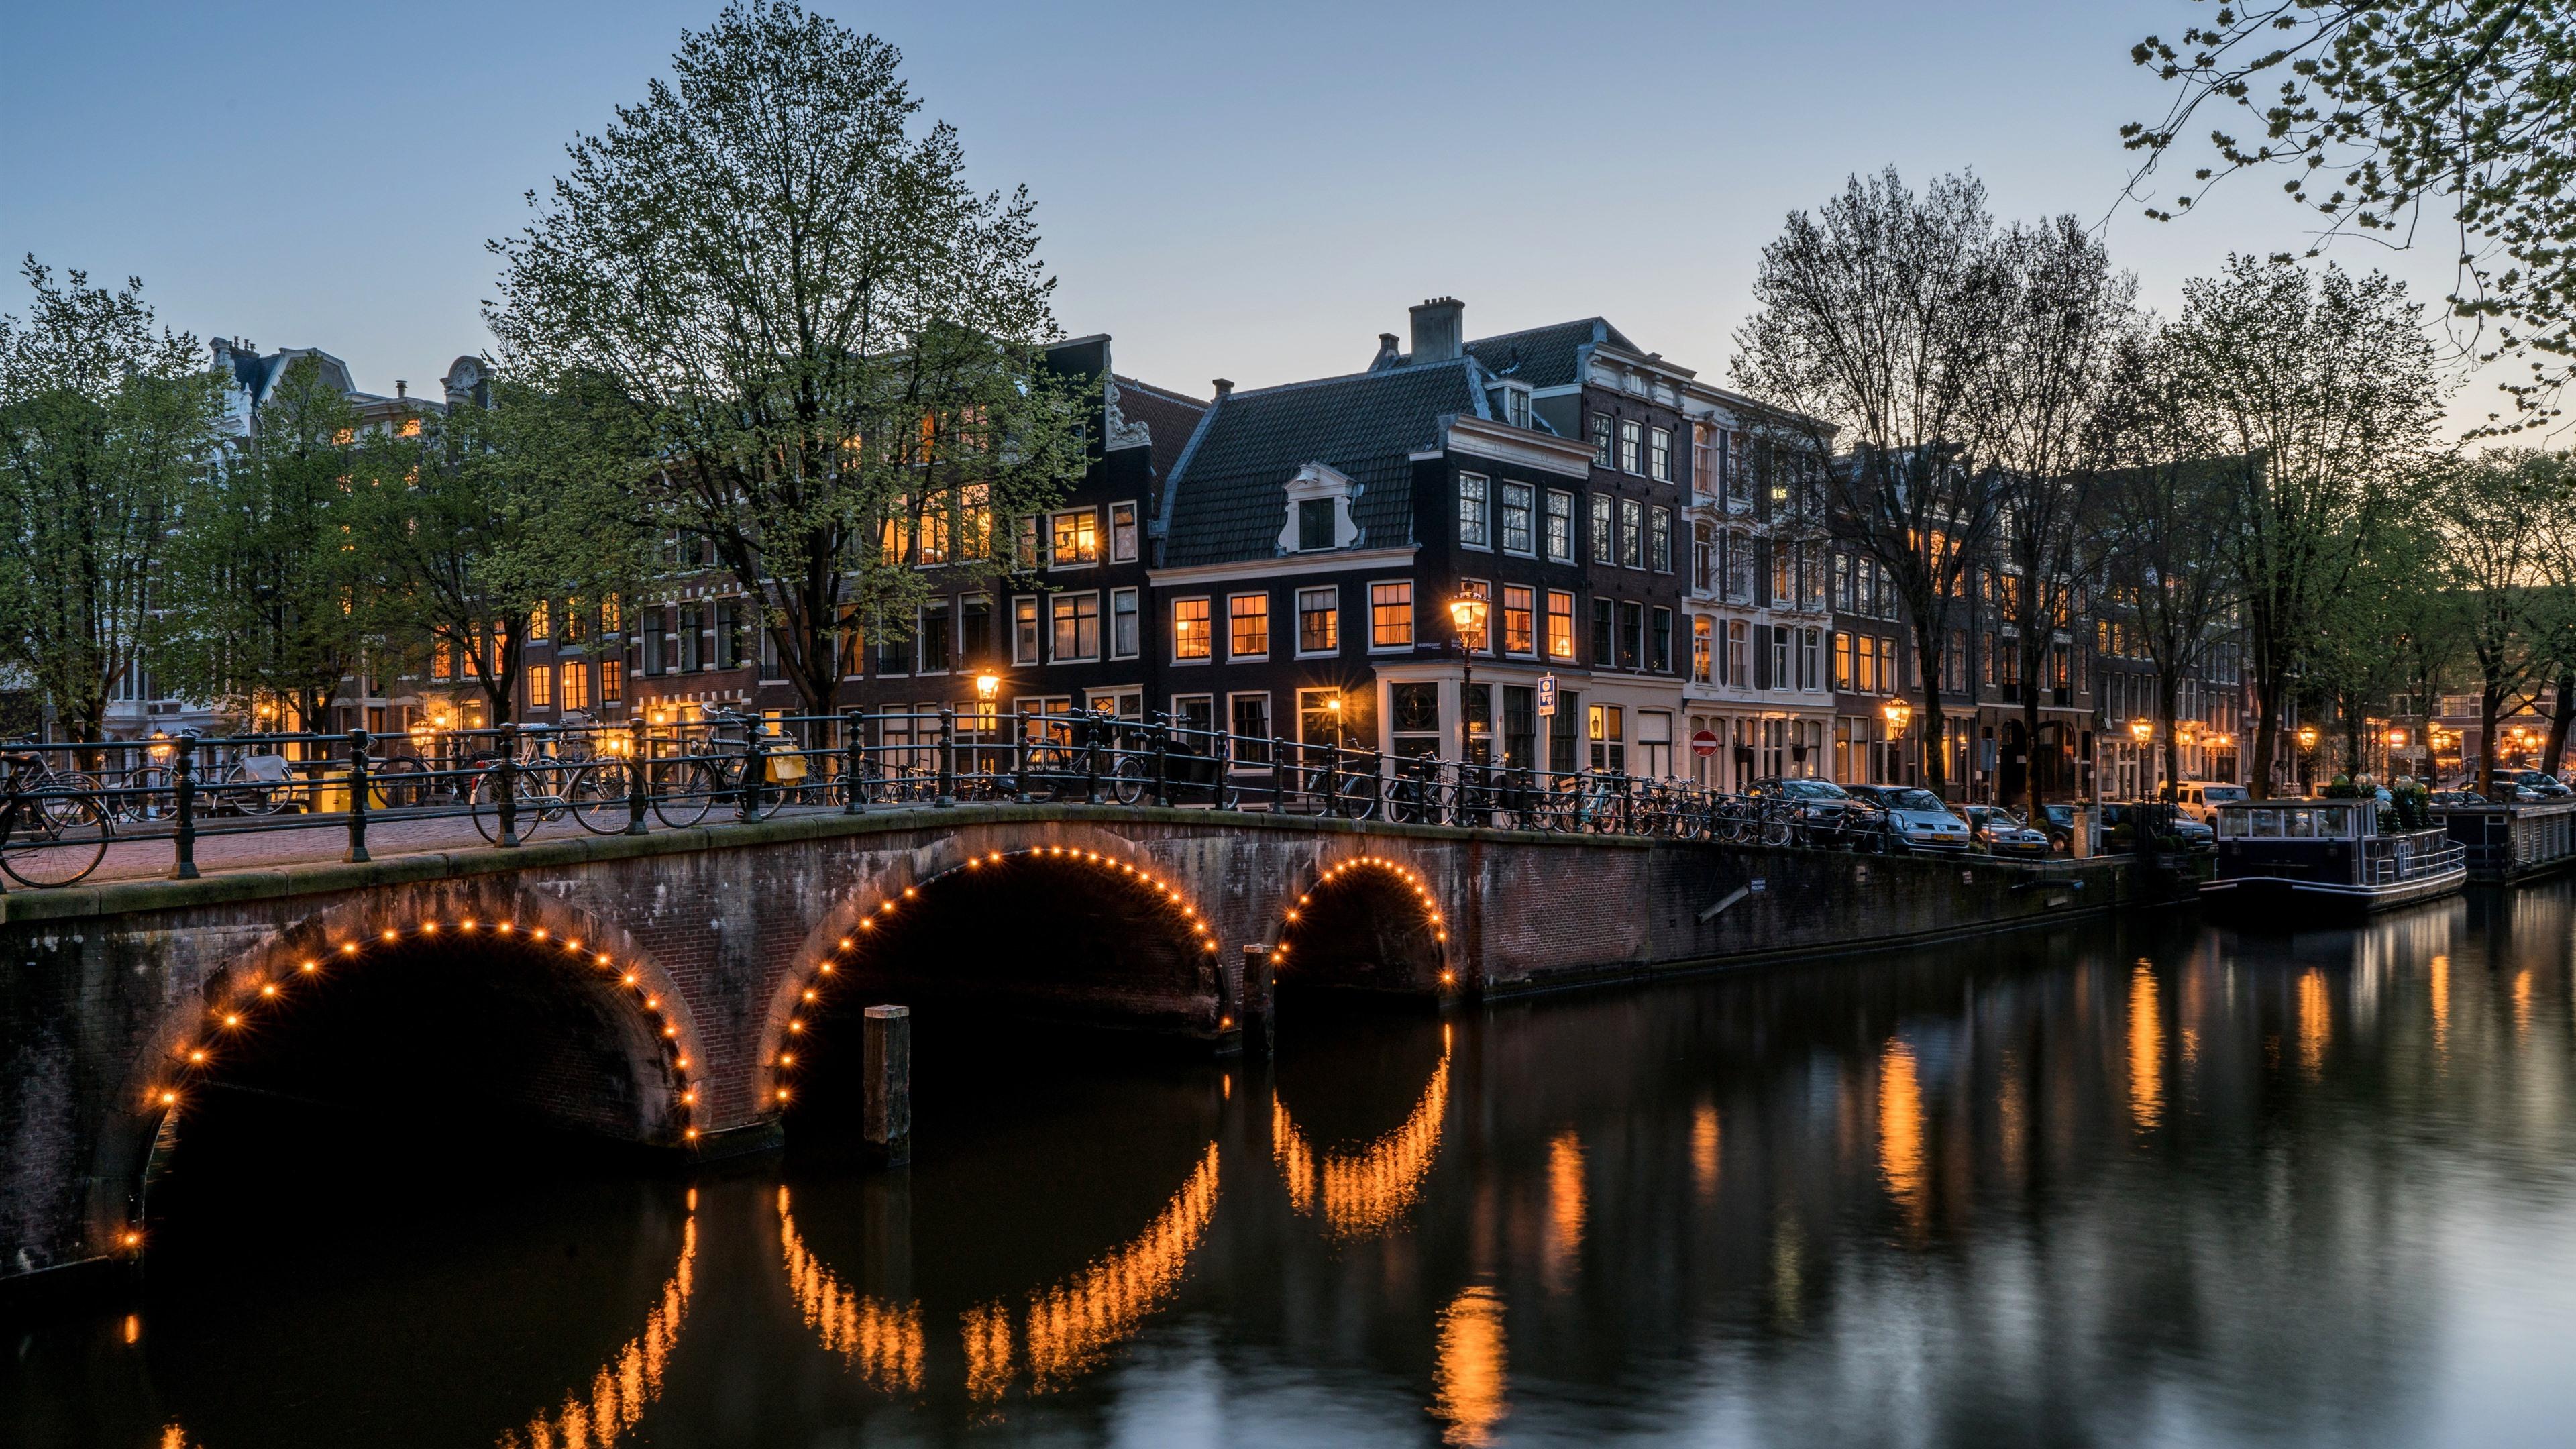 Wallpaper Amsterdam Night City River Bridge Houses